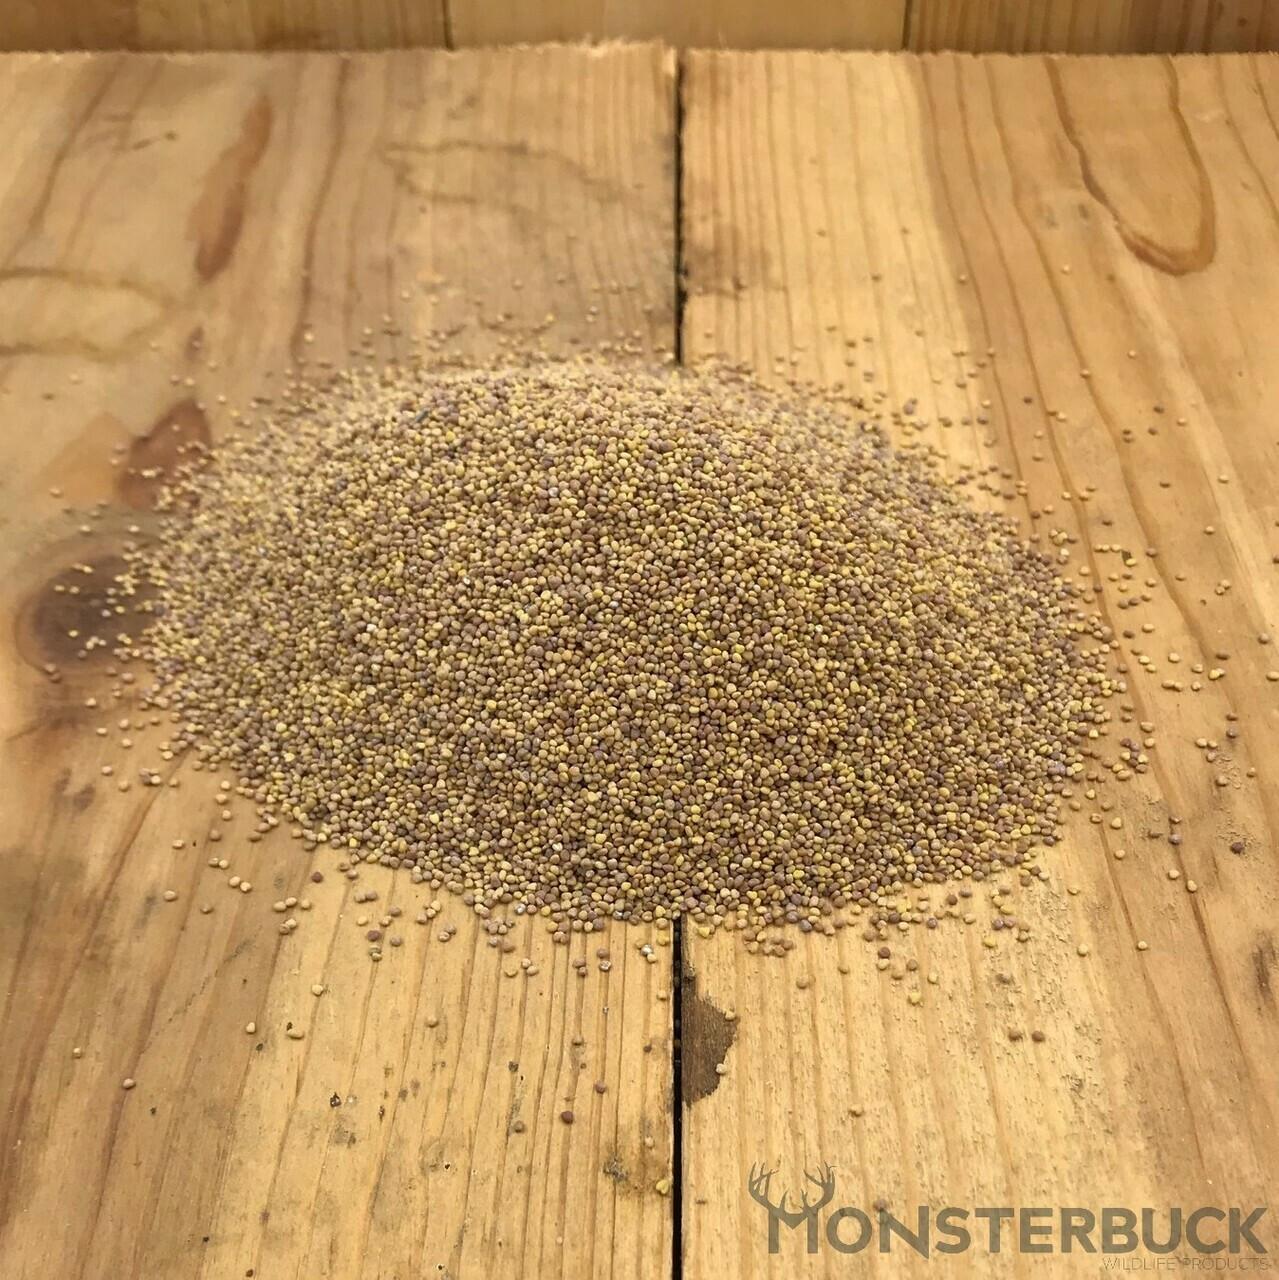 White Dutch Clover Food Plot Seed